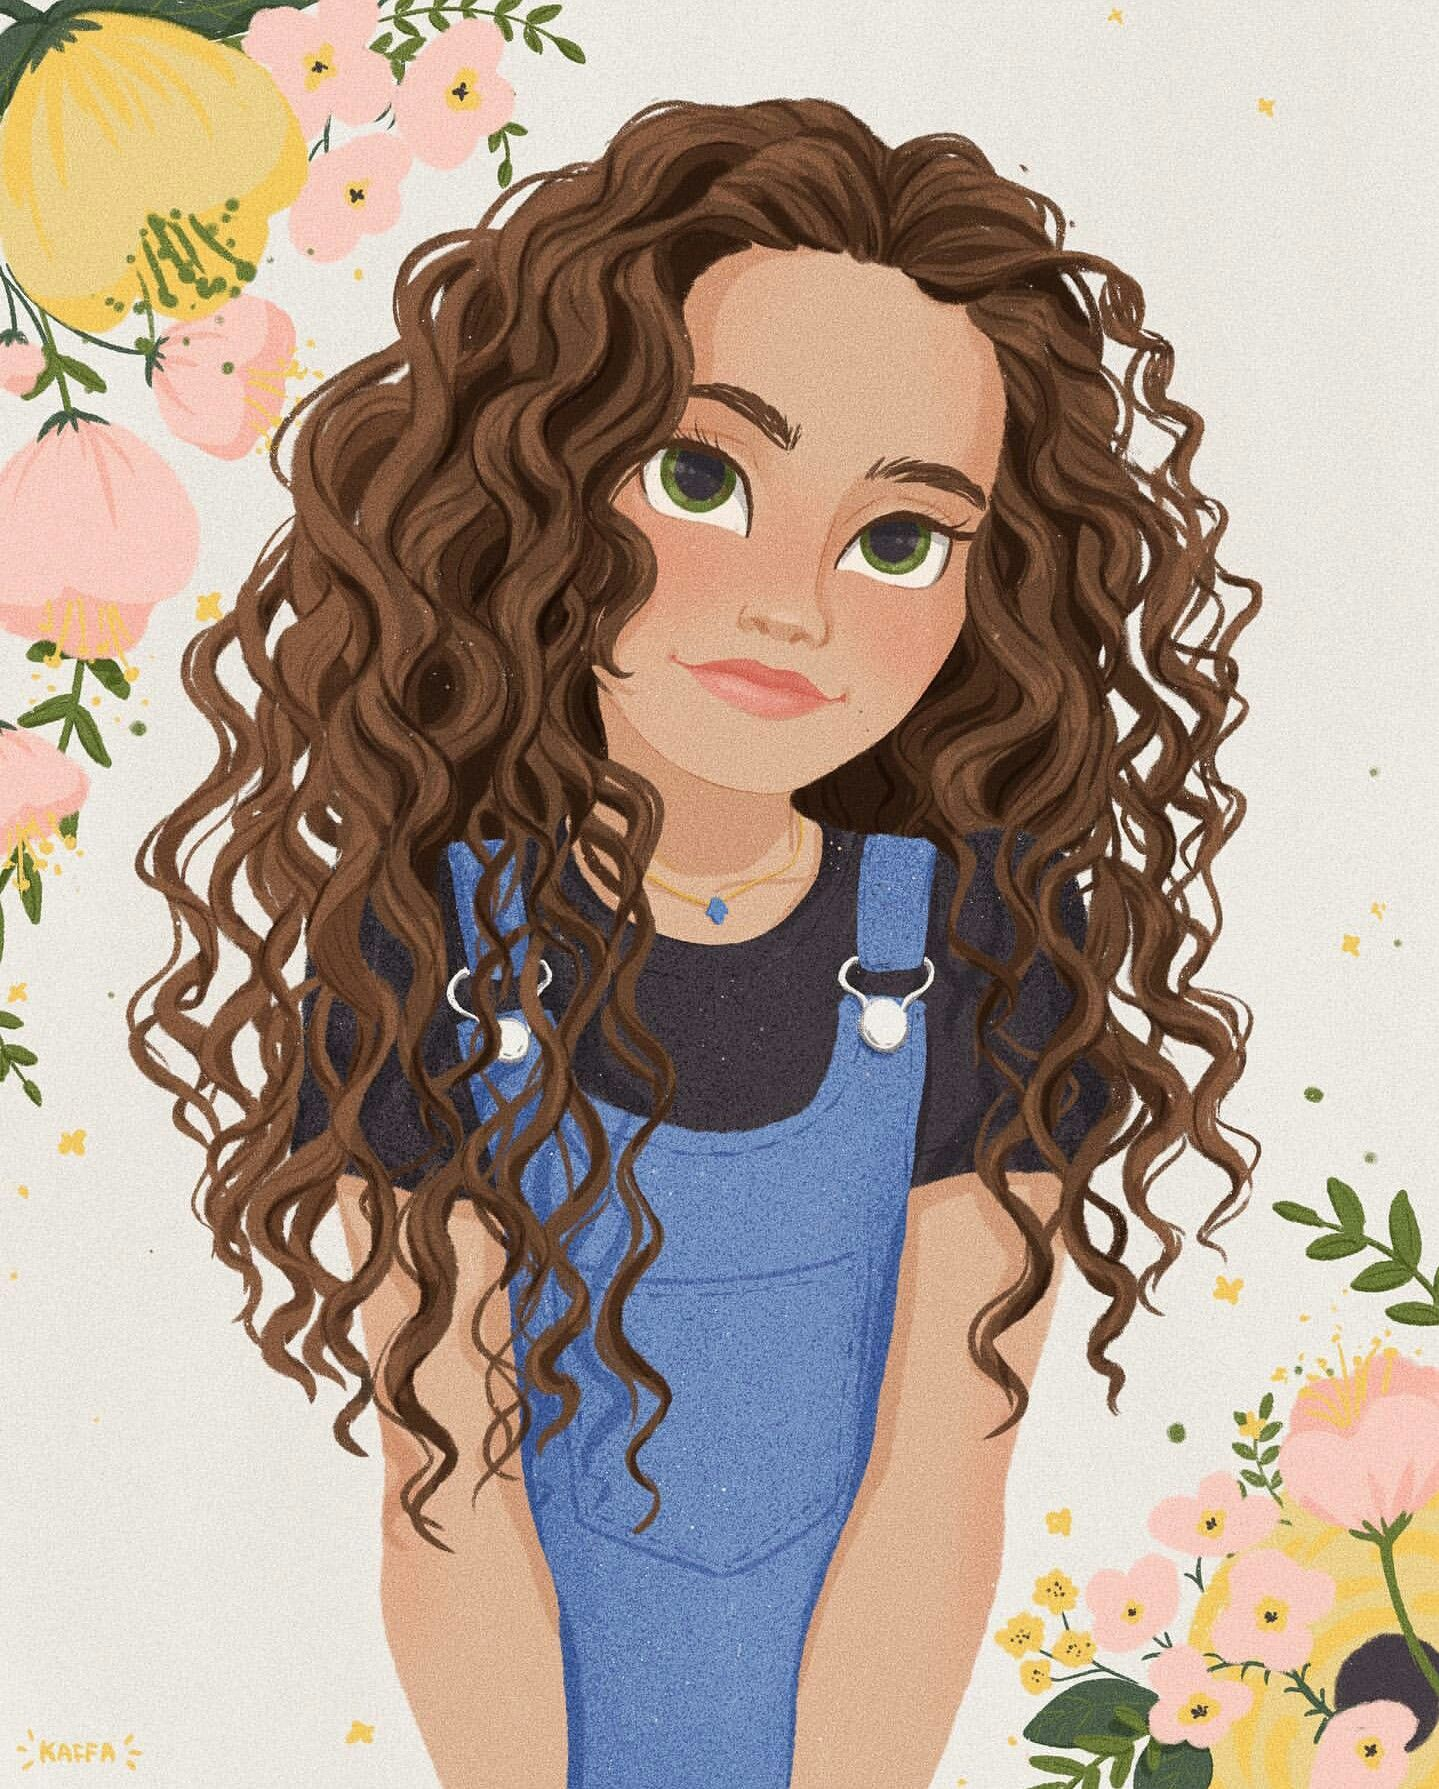 Pin By Kimberly C On Cizim In 2020 Curly Hair Cartoon Anime Curly Hair Girl Cartoon Characters